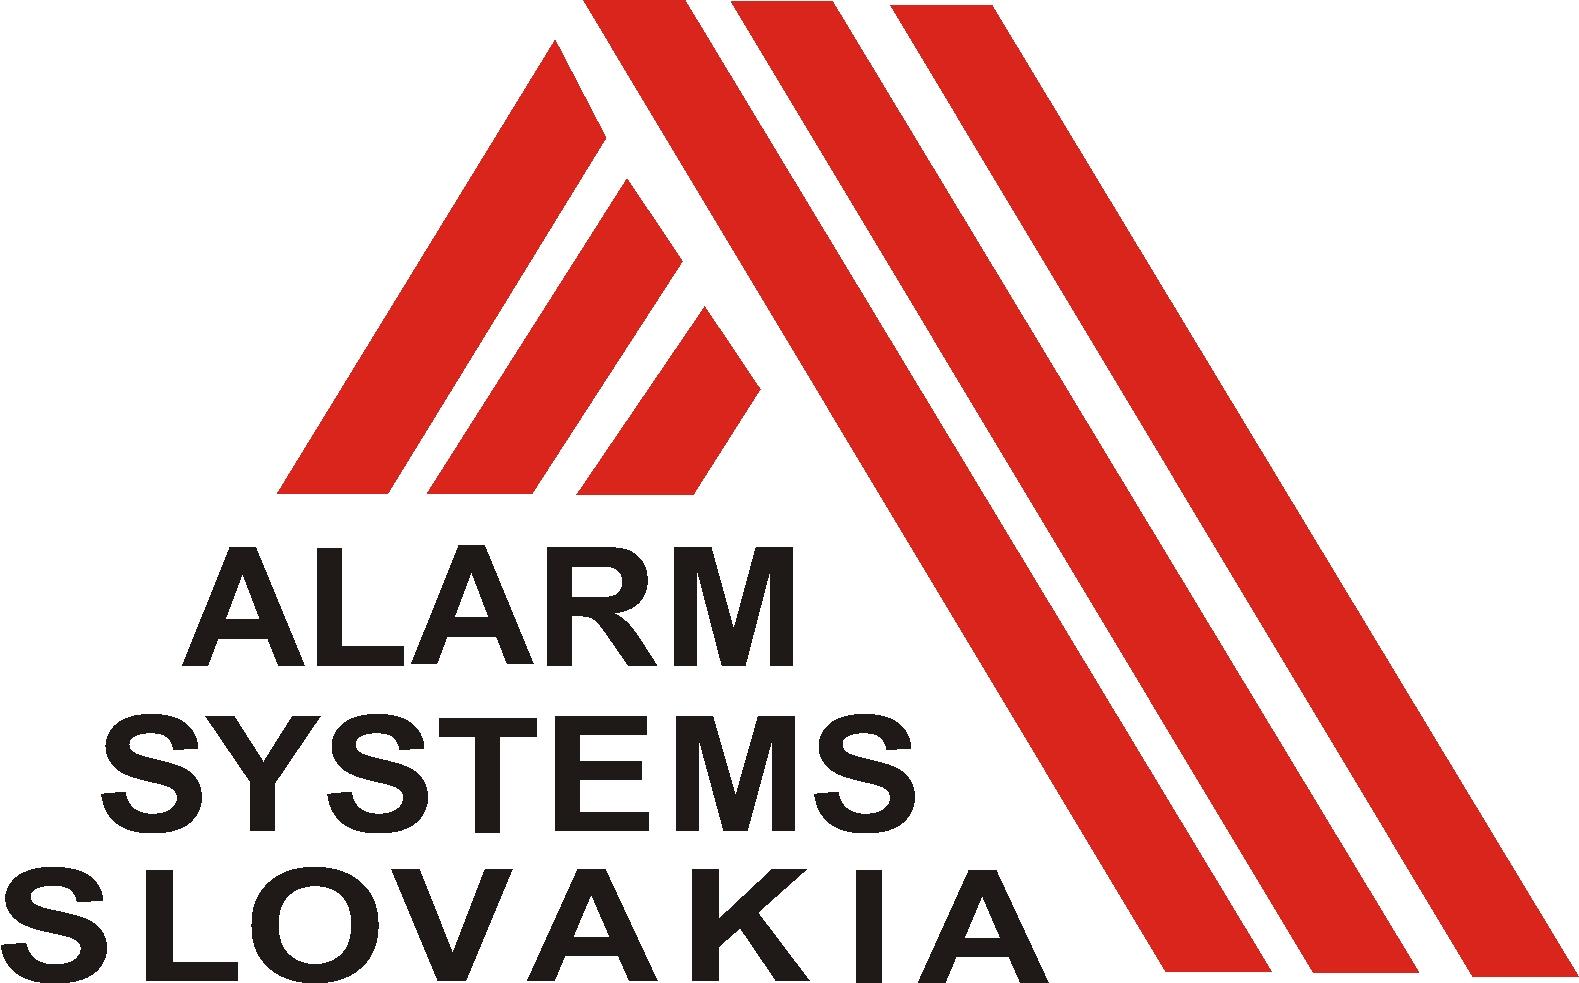 Slovak alarms s.r.o.